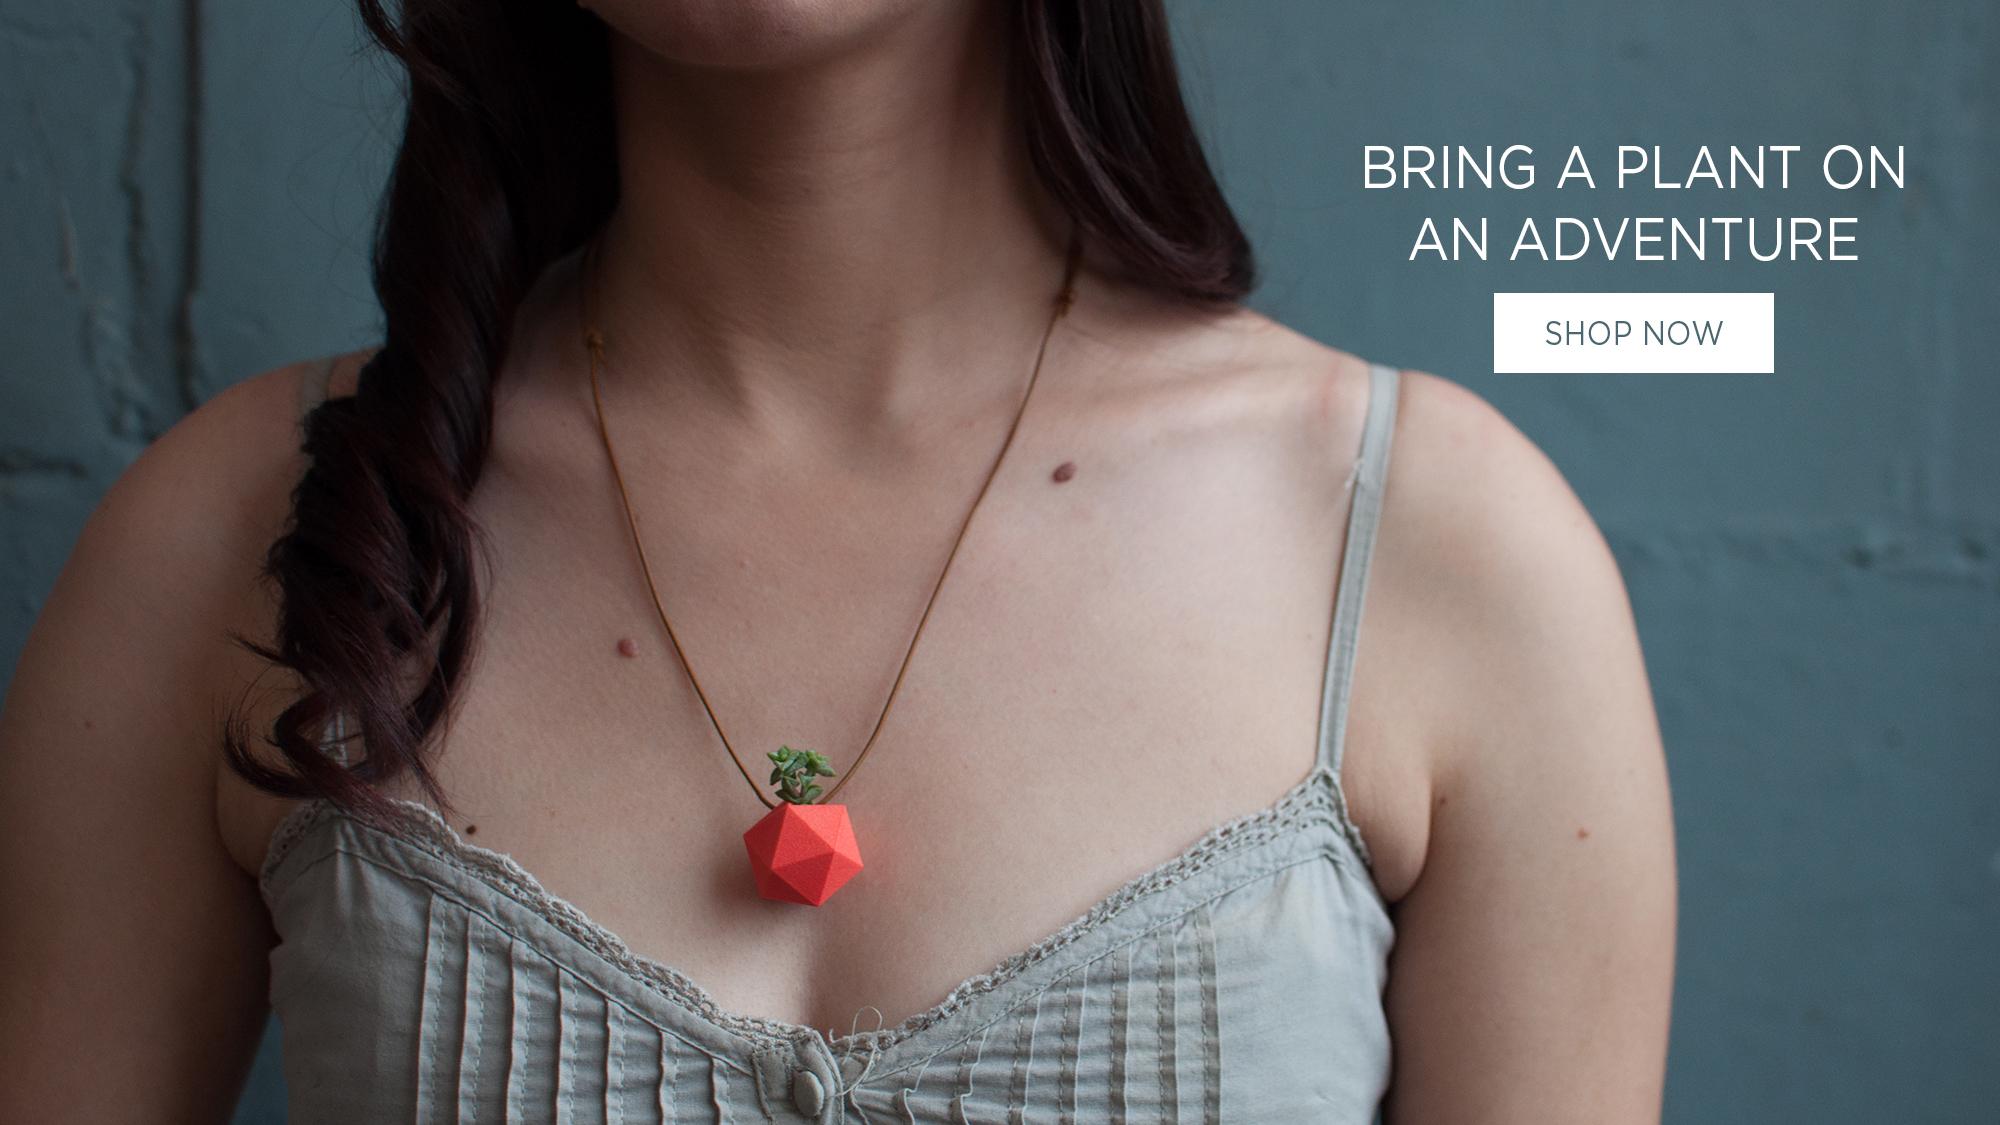 necklacecarousel-1a.jpg